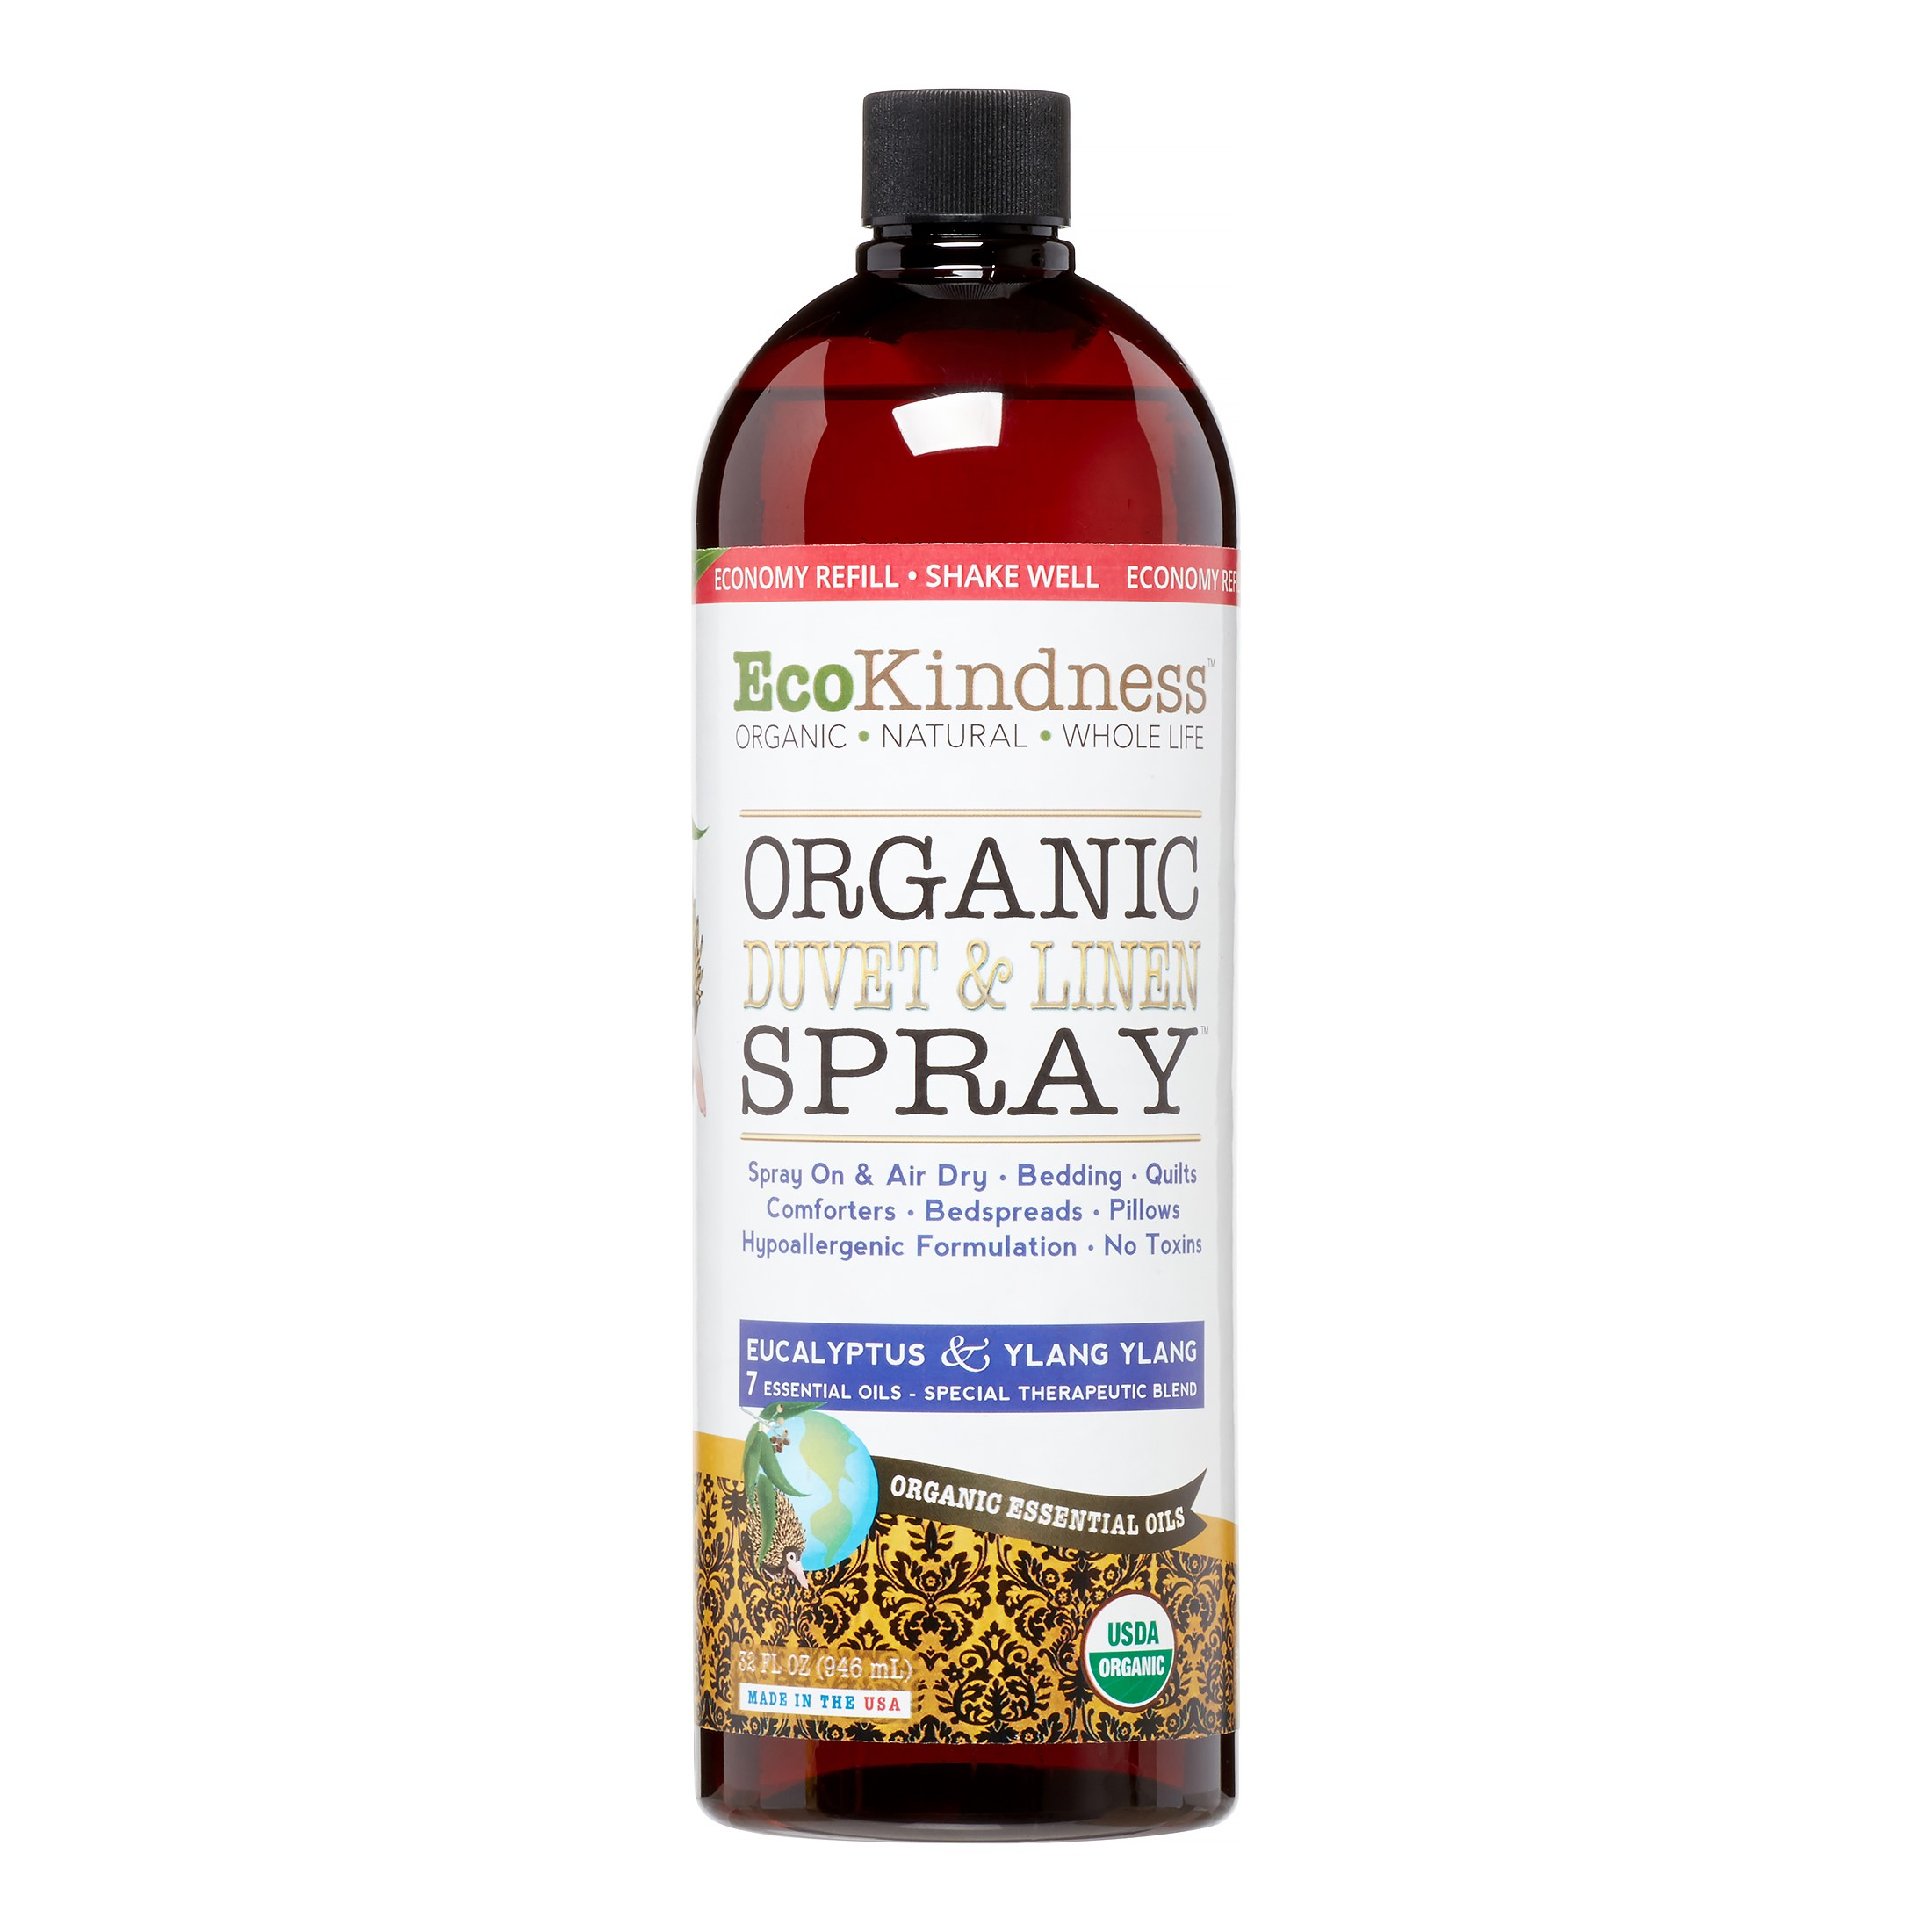 EcoKindness Organic Duvet & Linen Spray Economy Refill, Eucalyptus & Ylang Ylang, 32 Fl Oz